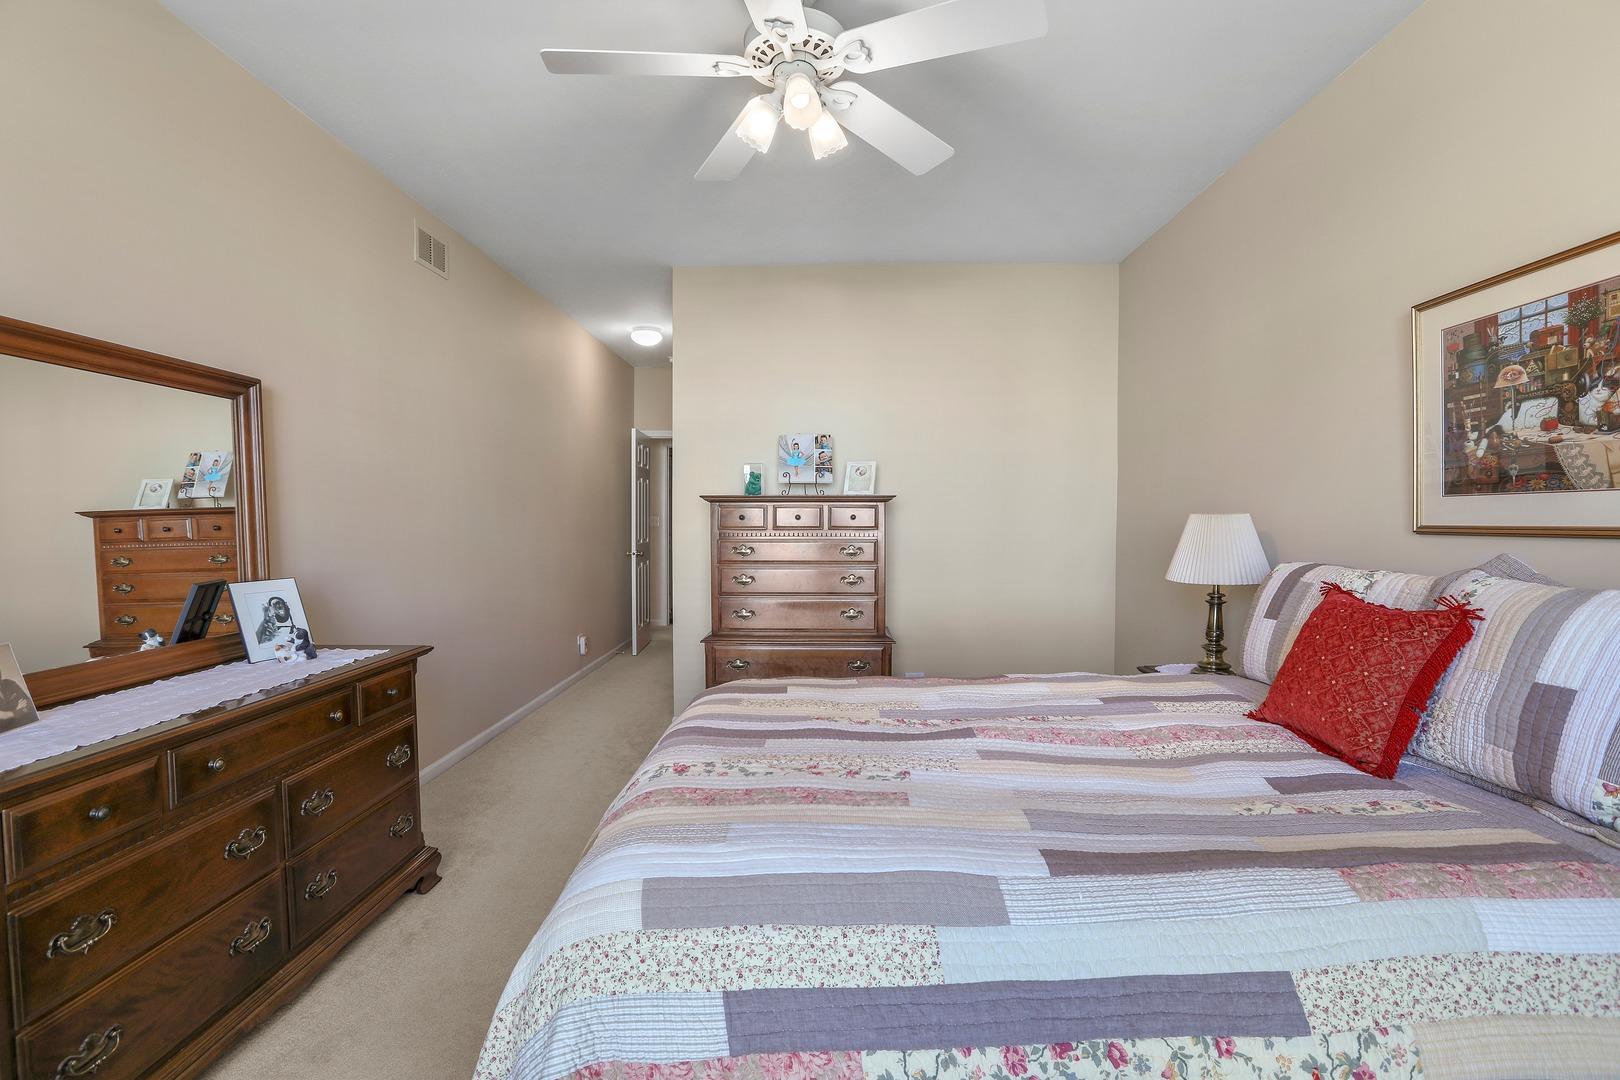 818 Pheasant, ST. CHARLES, Illinois, 60174